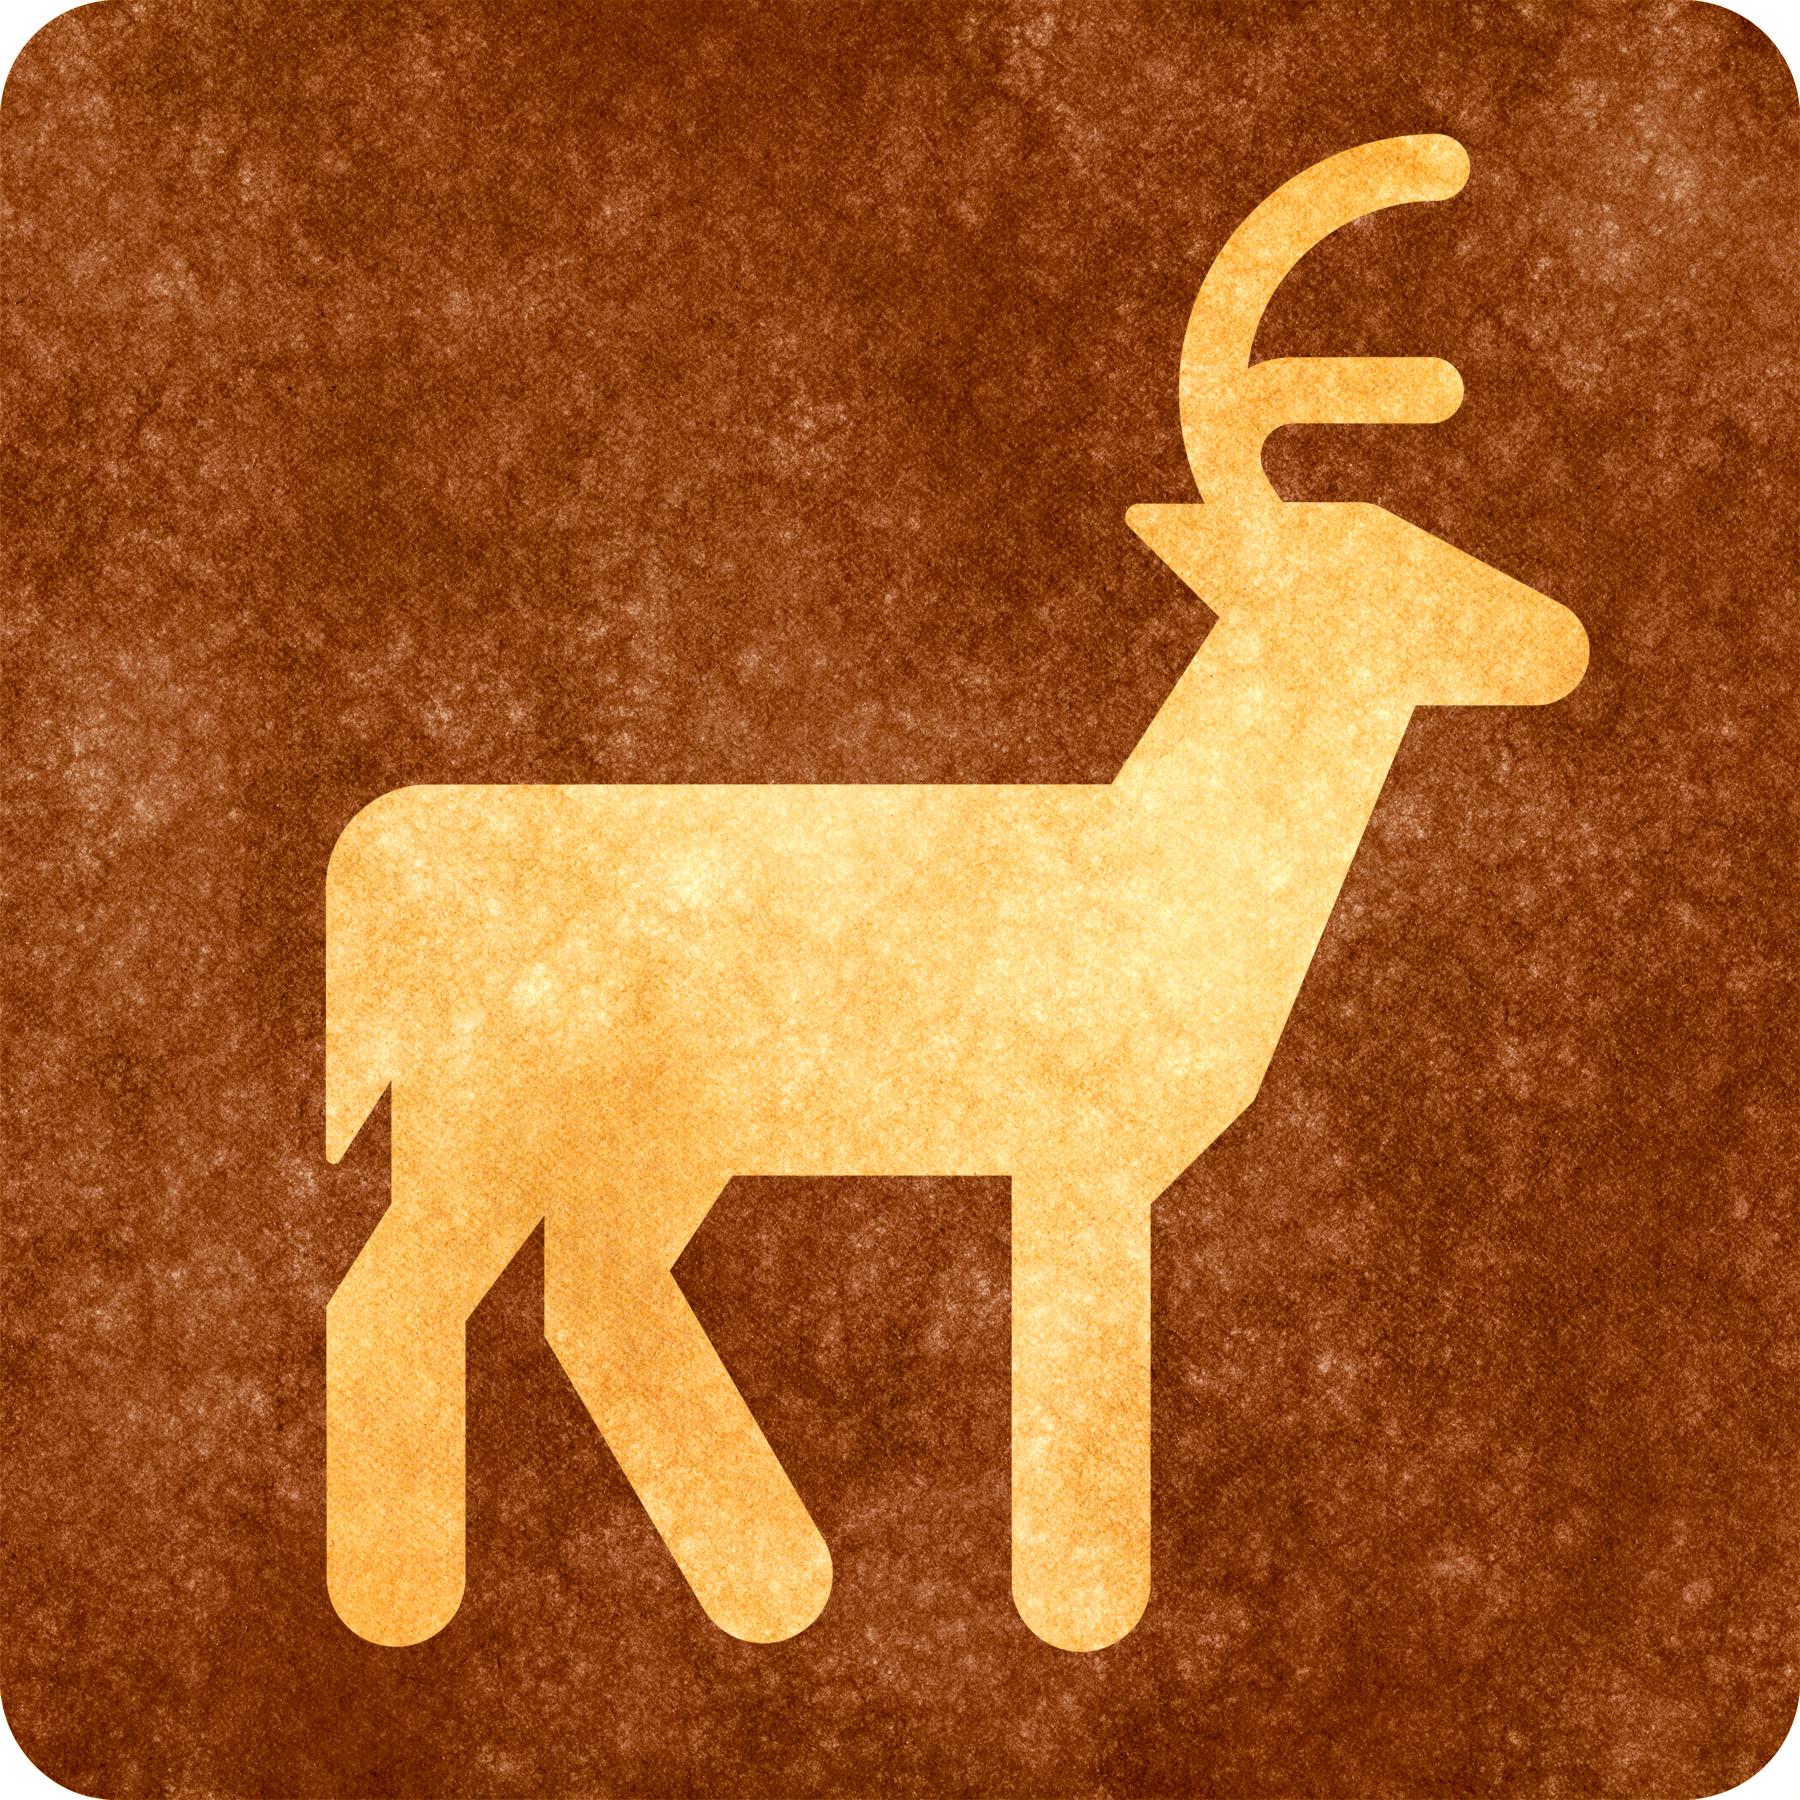 Sepia grunge sign - deer viewing photo